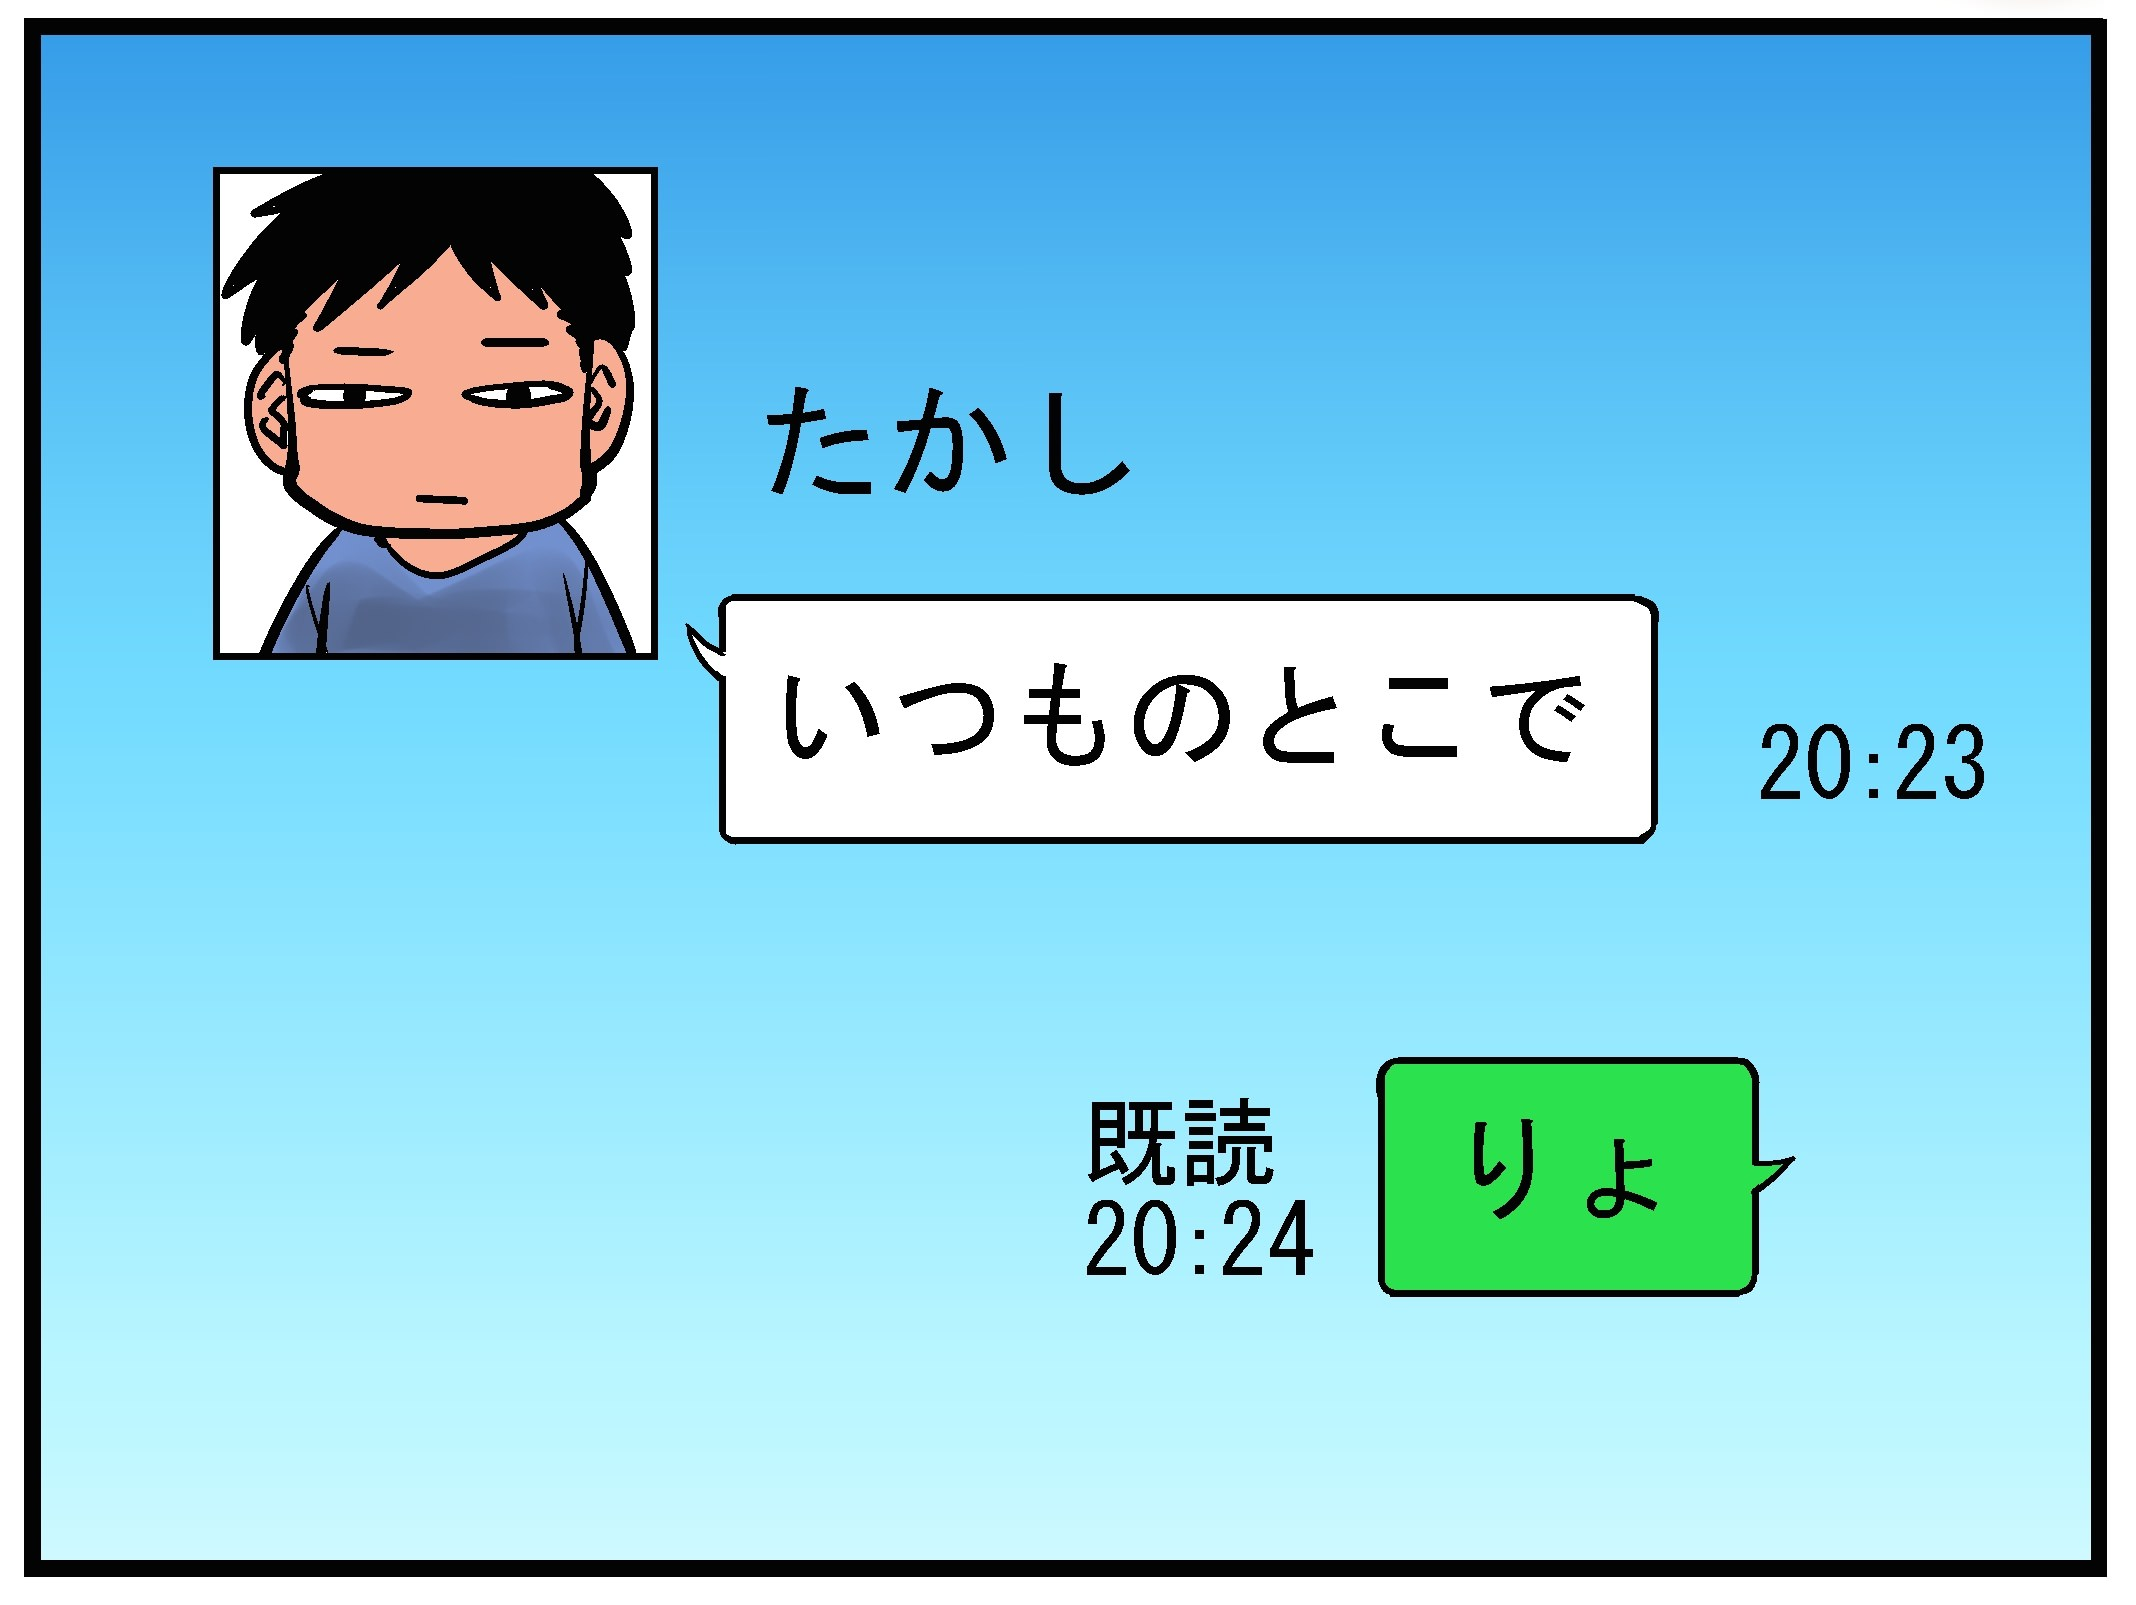 b2b95592ae90cb5bd64f4cbda0453d14